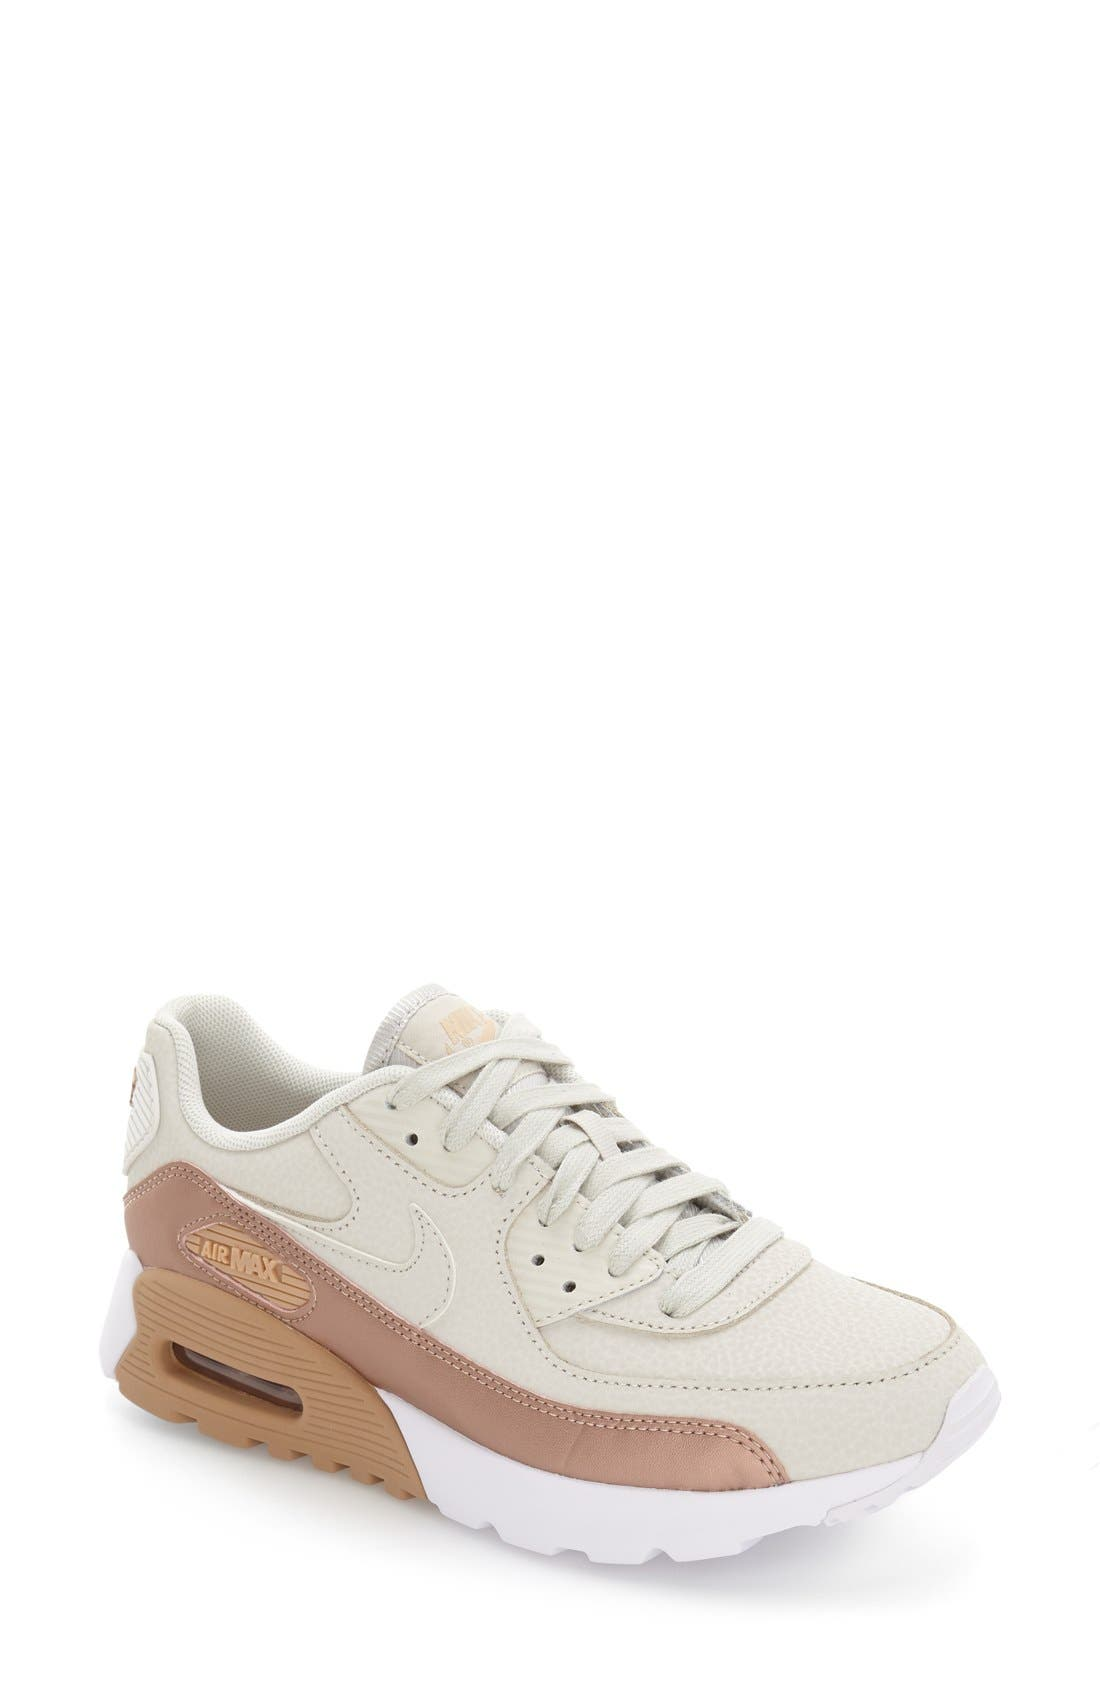 Nike Air Max 90 Ultra SE Sneaker (Women)